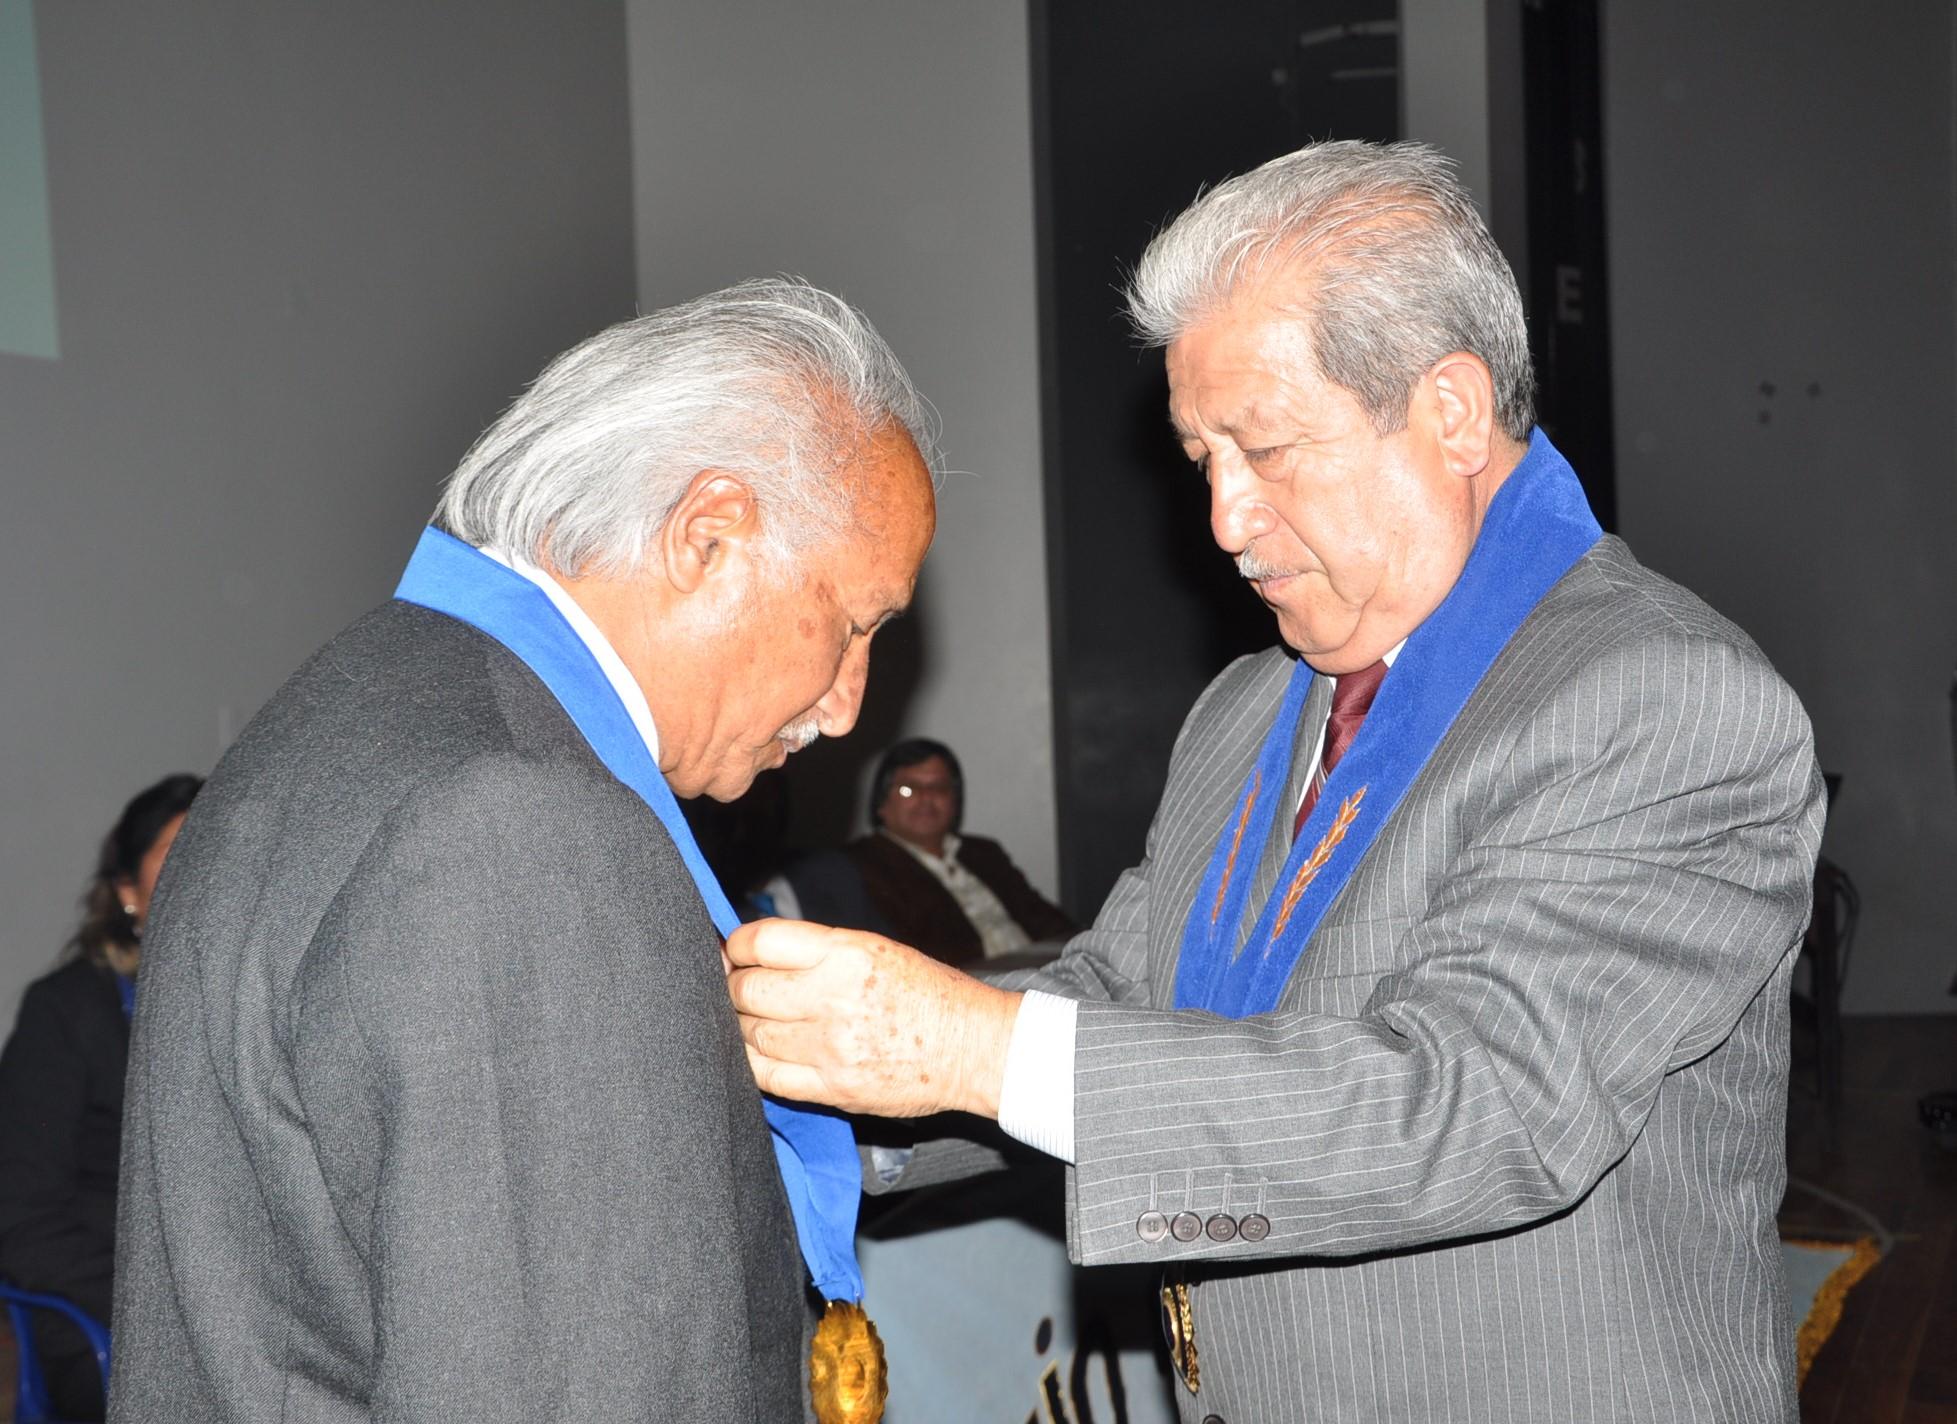 CONVOCATORIA A CONCURSO DE MEDALLA DE HONOR DEL CPPe 2018